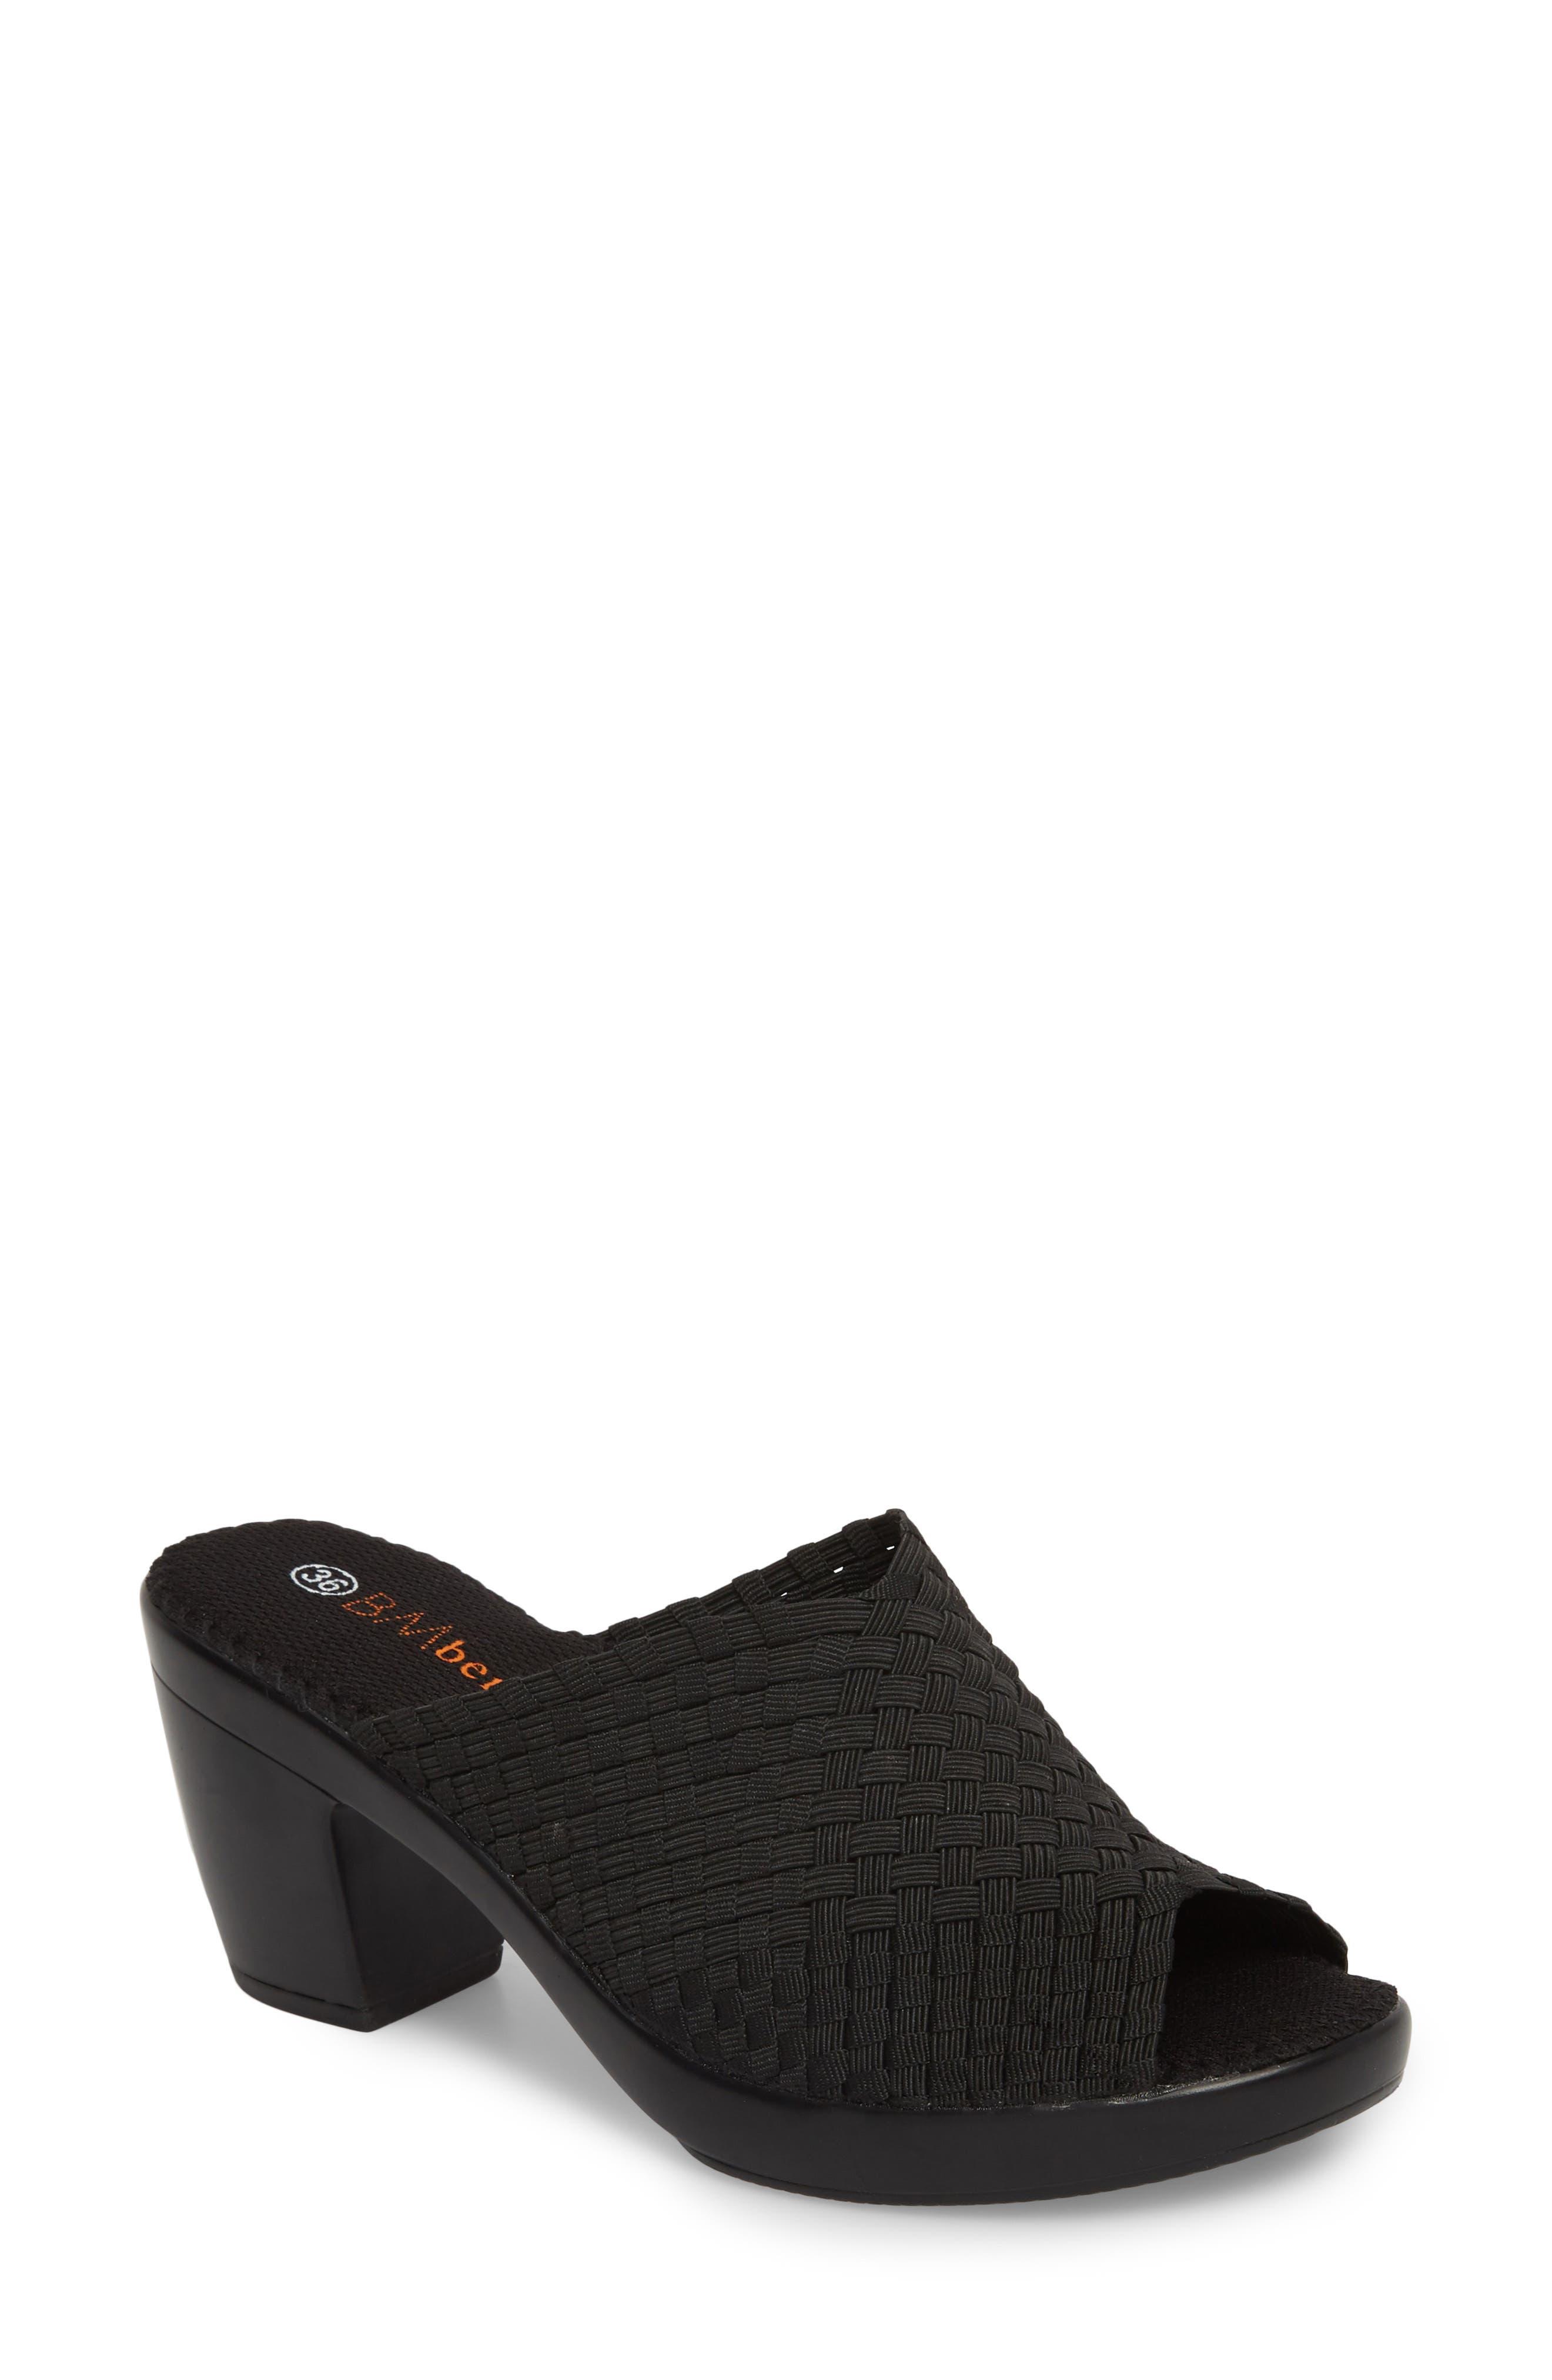 BERNIE MEV., Sun Texas Sandal, Main thumbnail 1, color, BLACK FABRIC